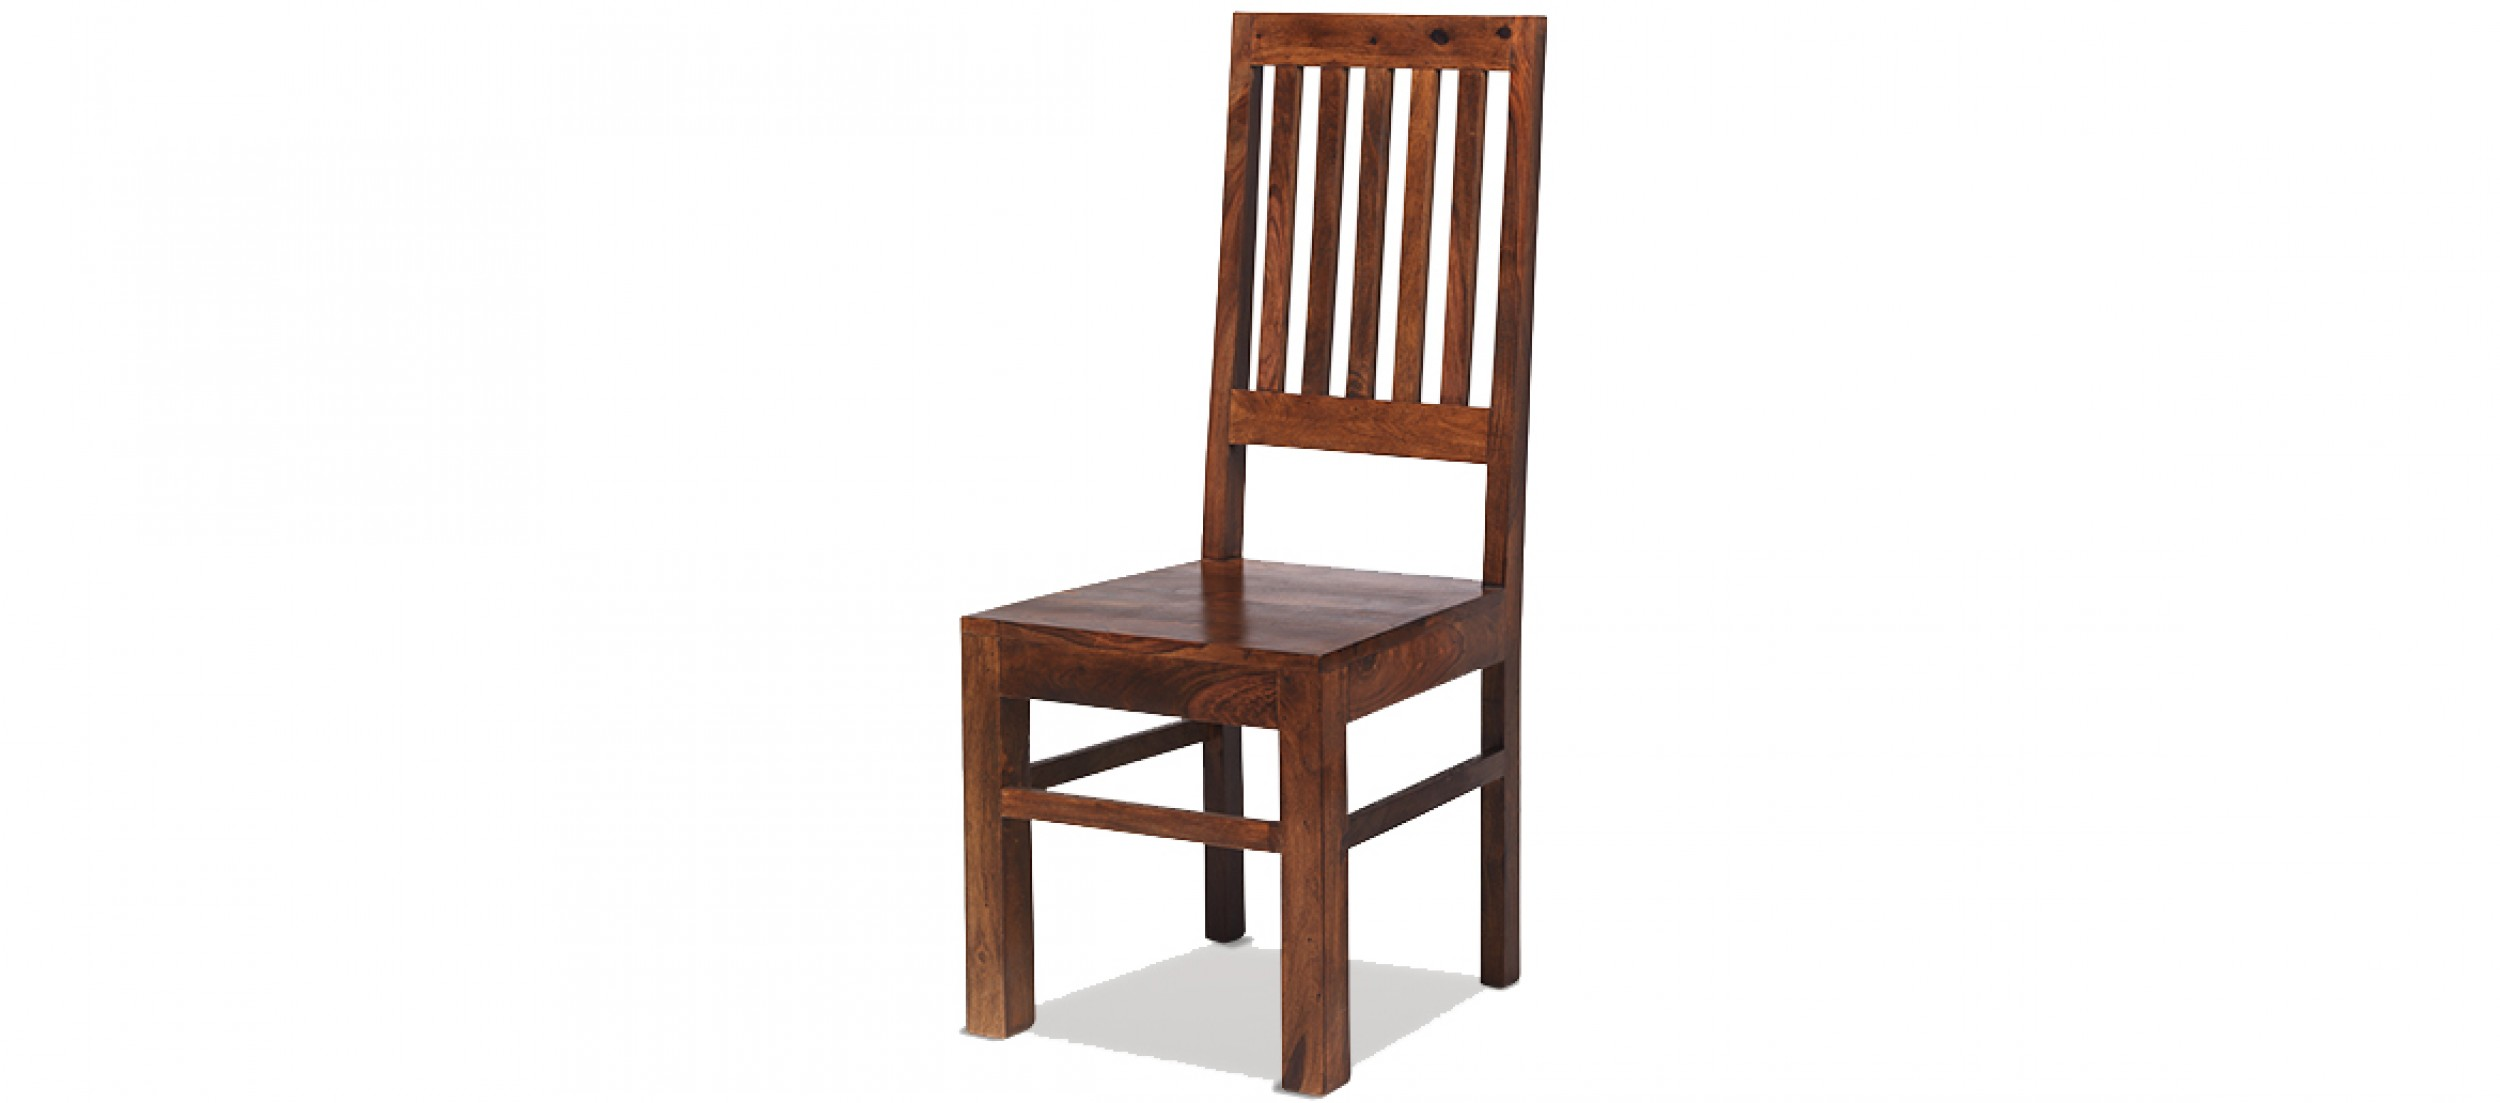 high back dining chairs circle lounge chair jali sheesham slat pair